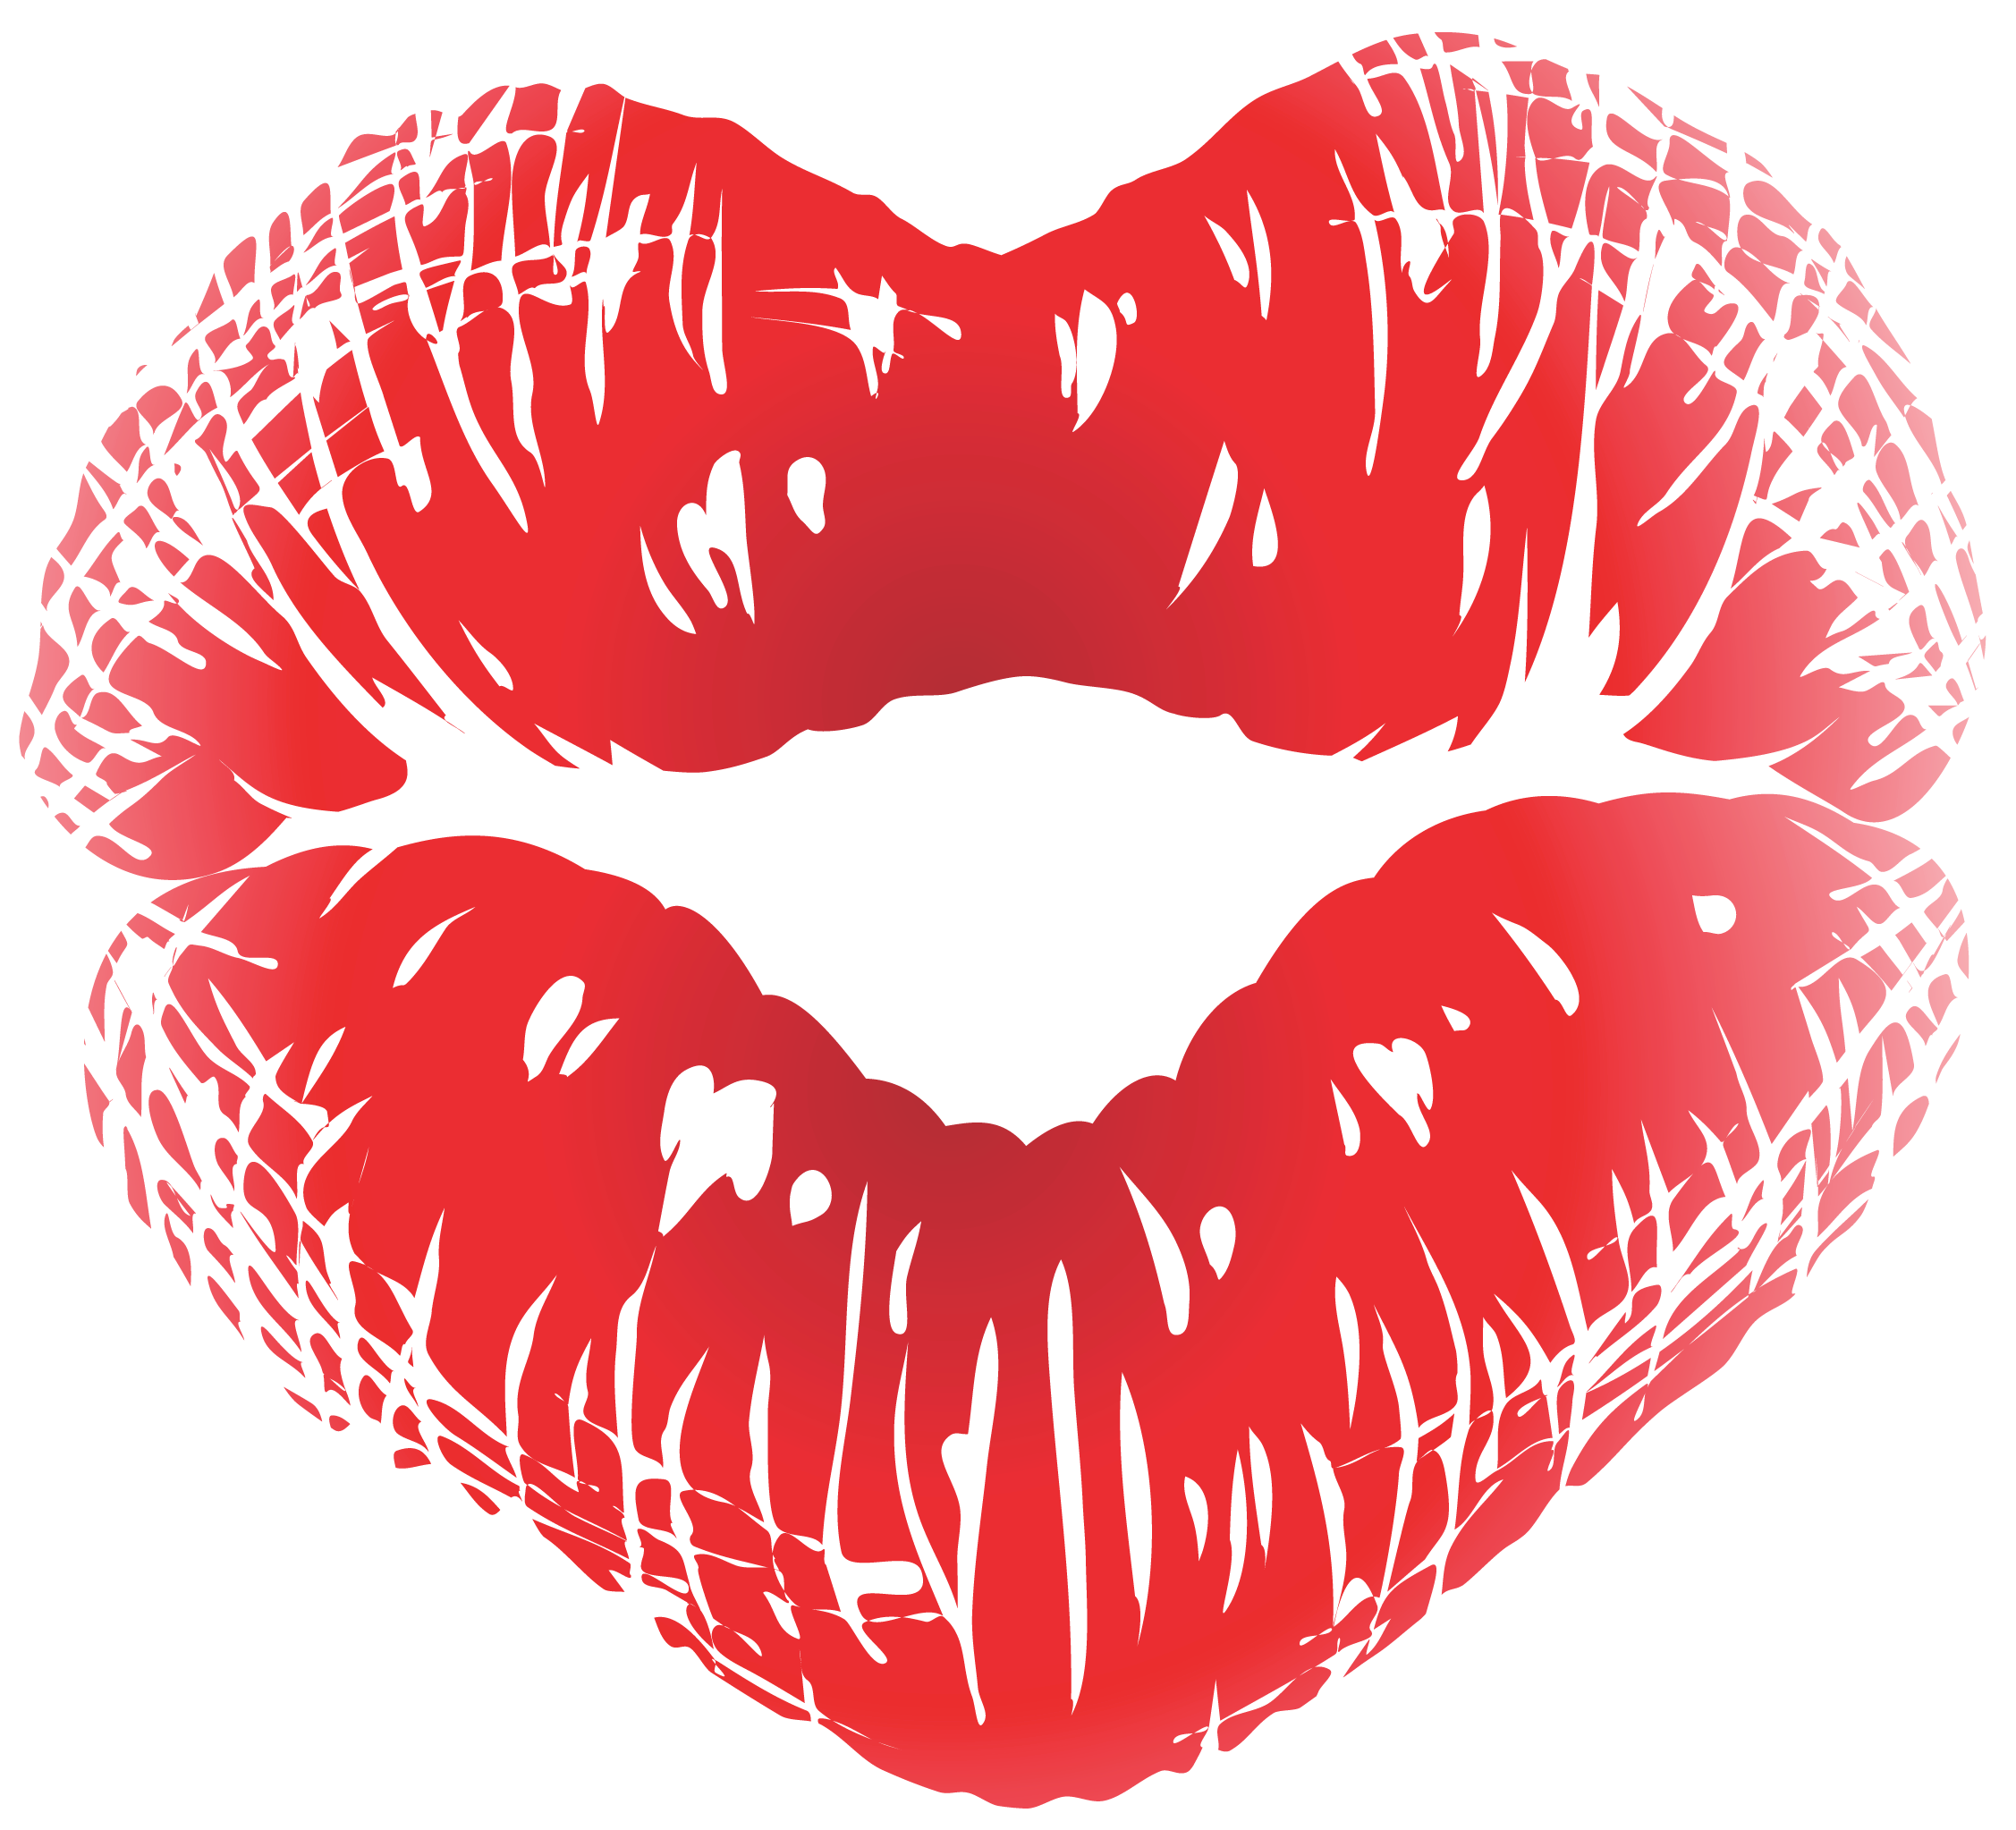 Kiss clipart Download clipart com Kiss on